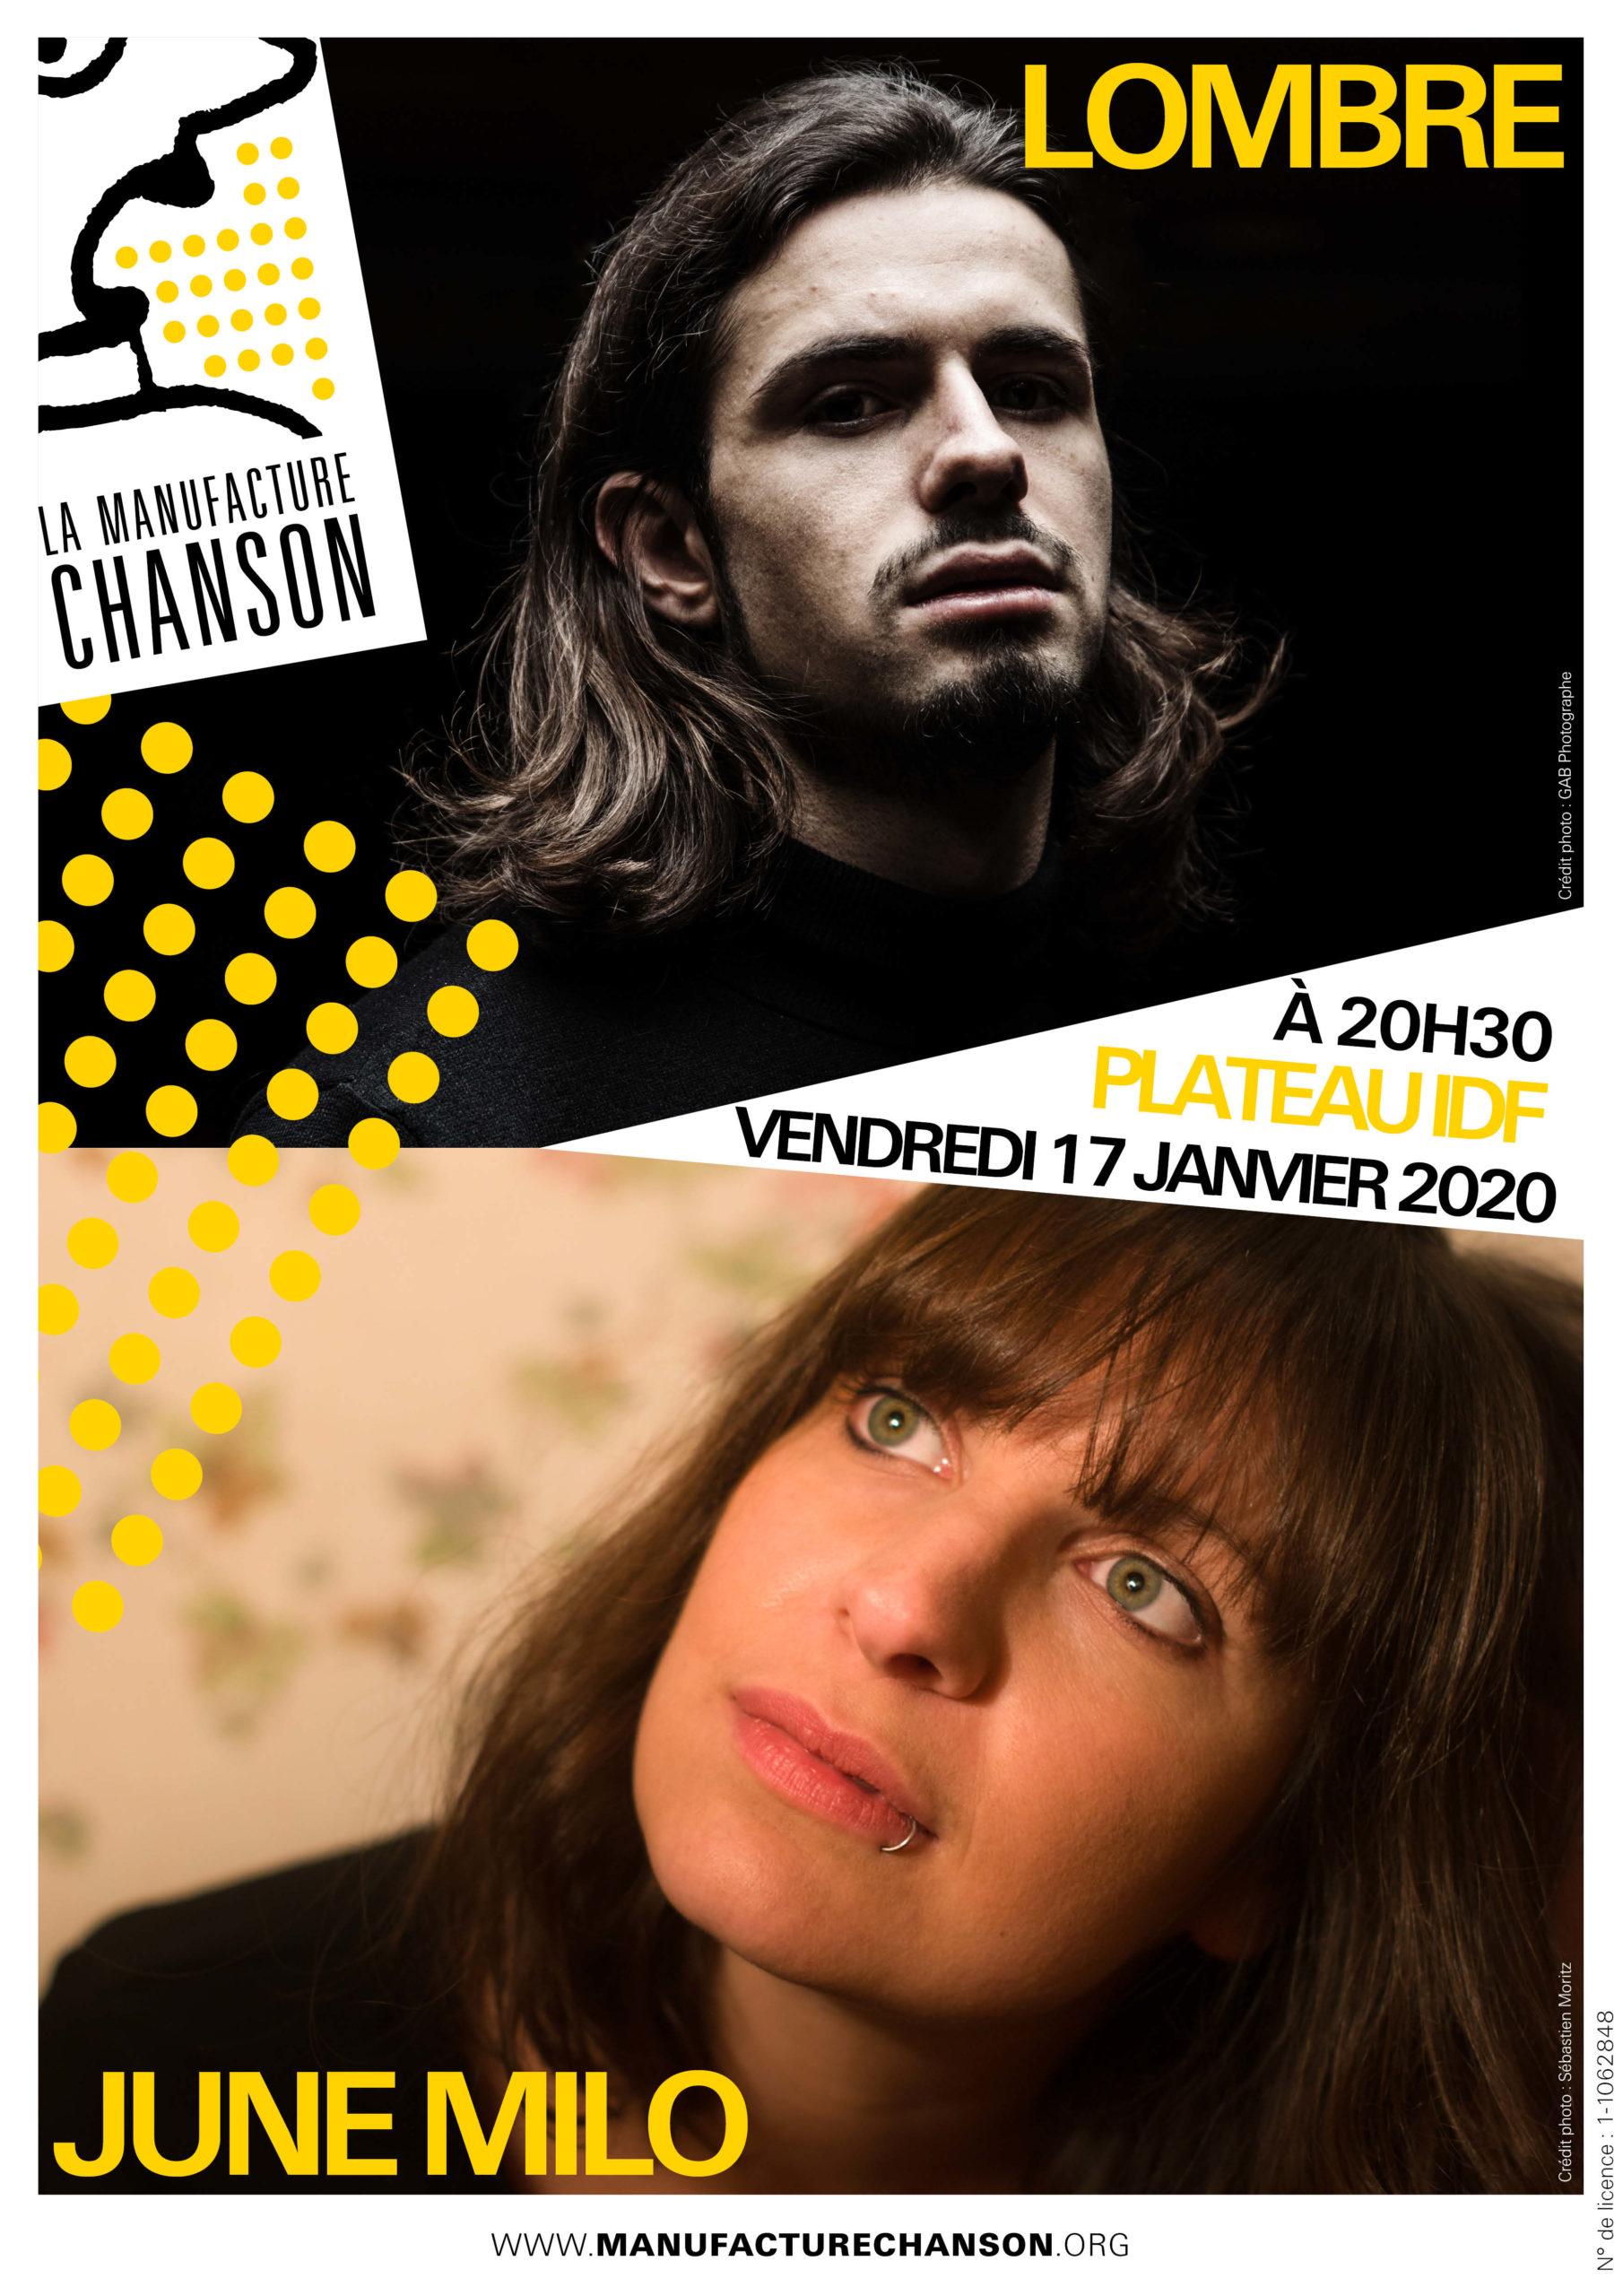 LOMBRE + JUNE MILO LA MANUFACTURE CHANSON